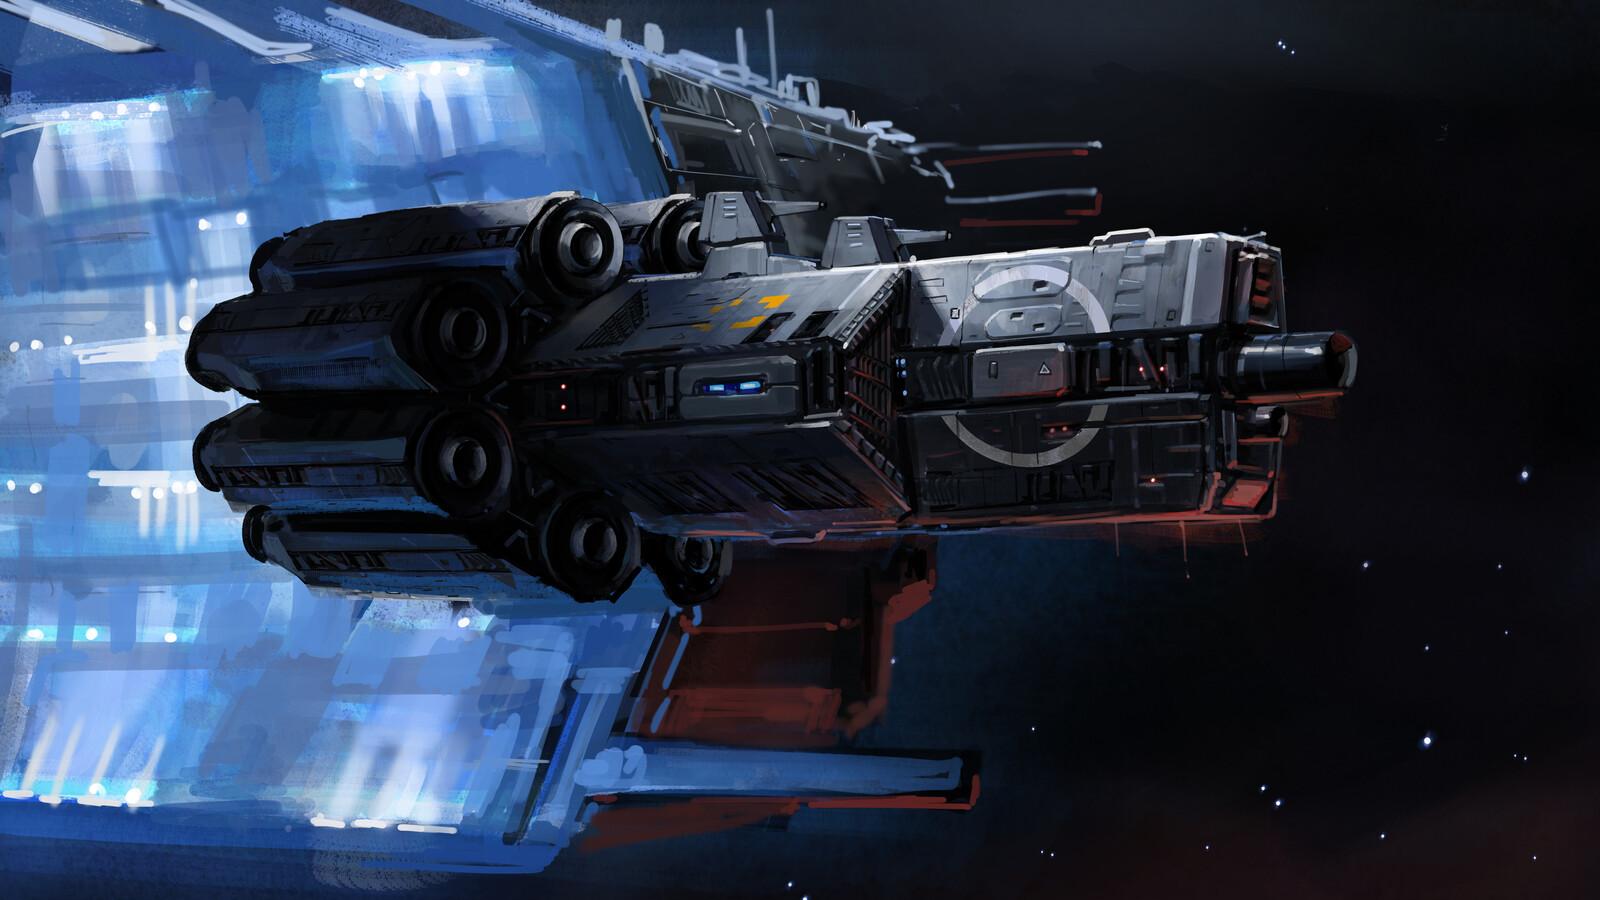 Atack frigate